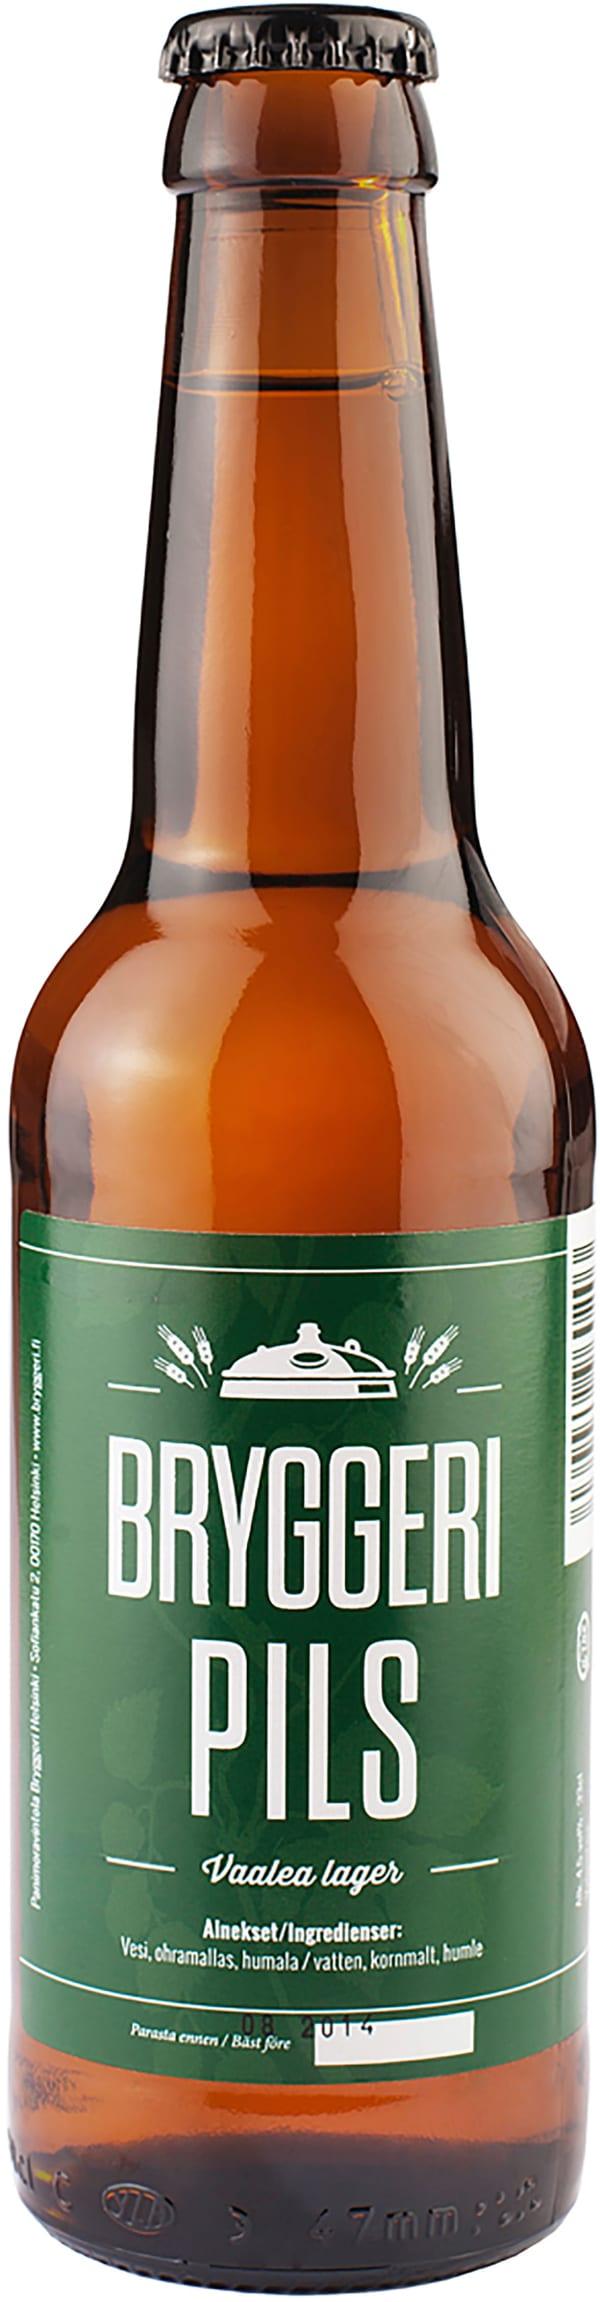 Bryggeri Pils